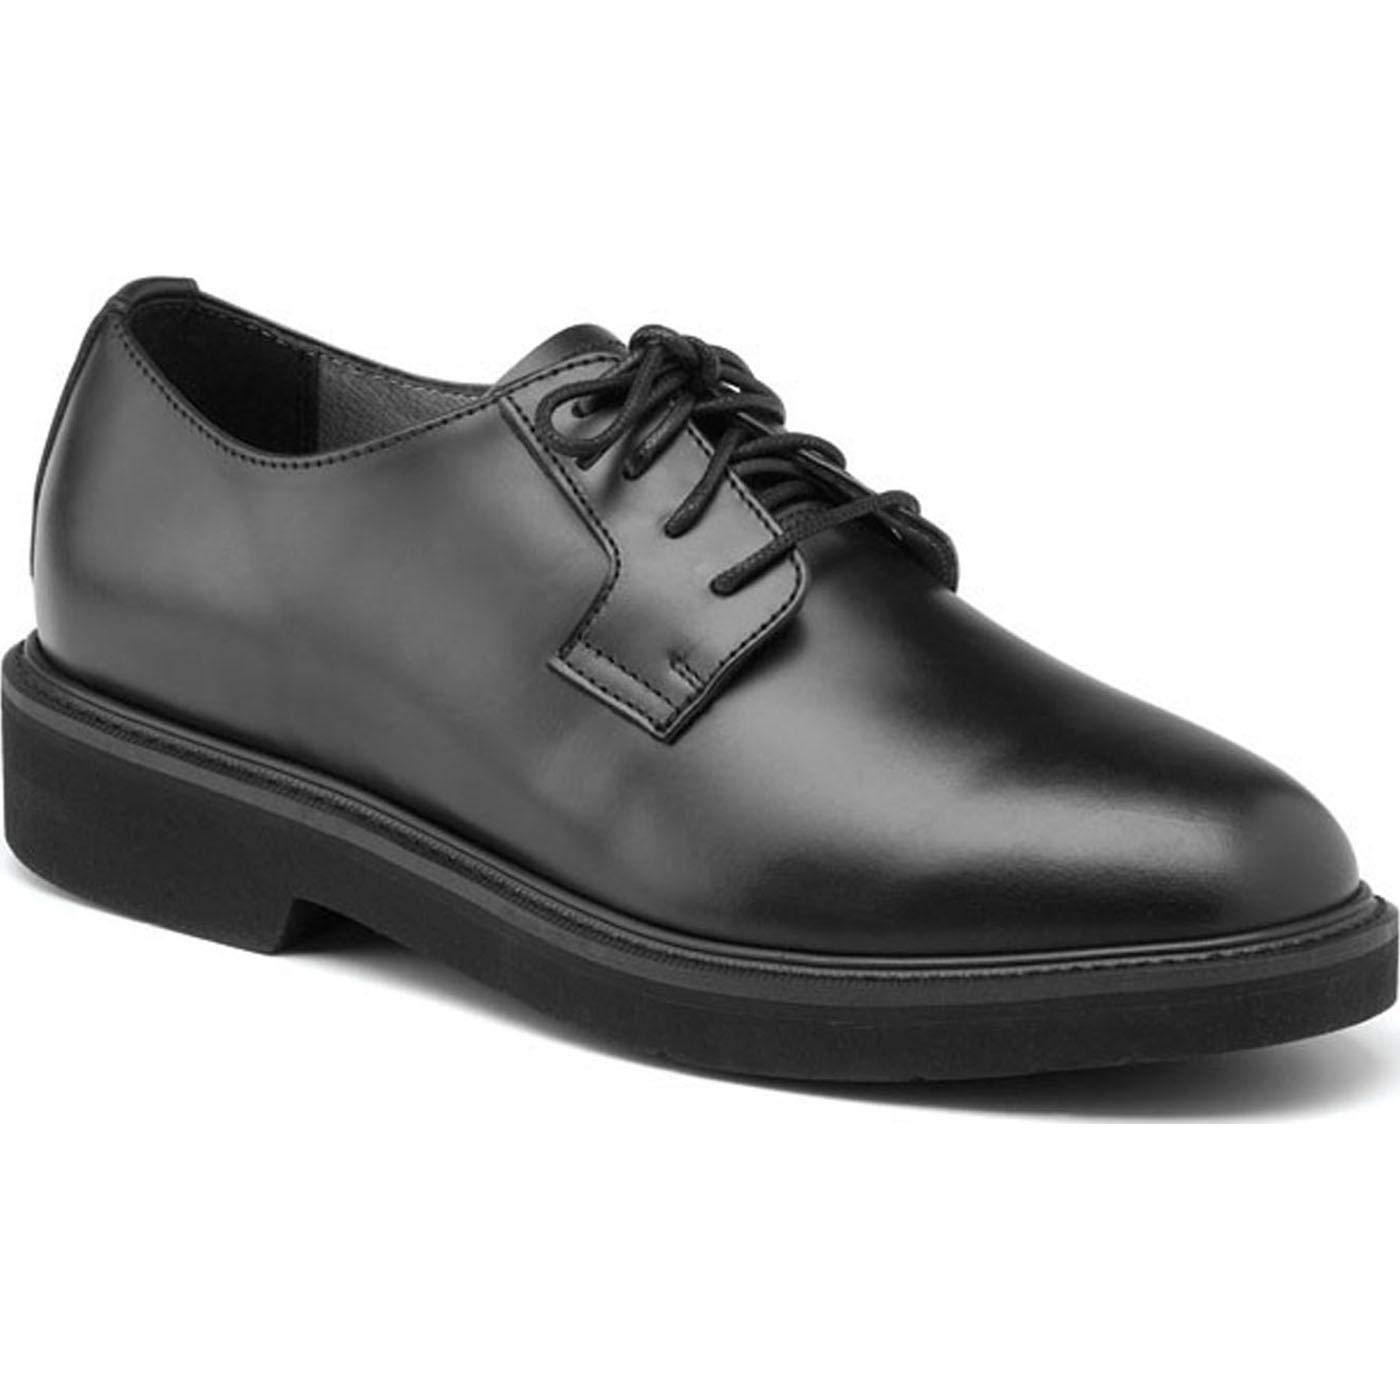 Rocky Work Shoes Mens Polishable Dress Leather Oxford Black FQ00511-8